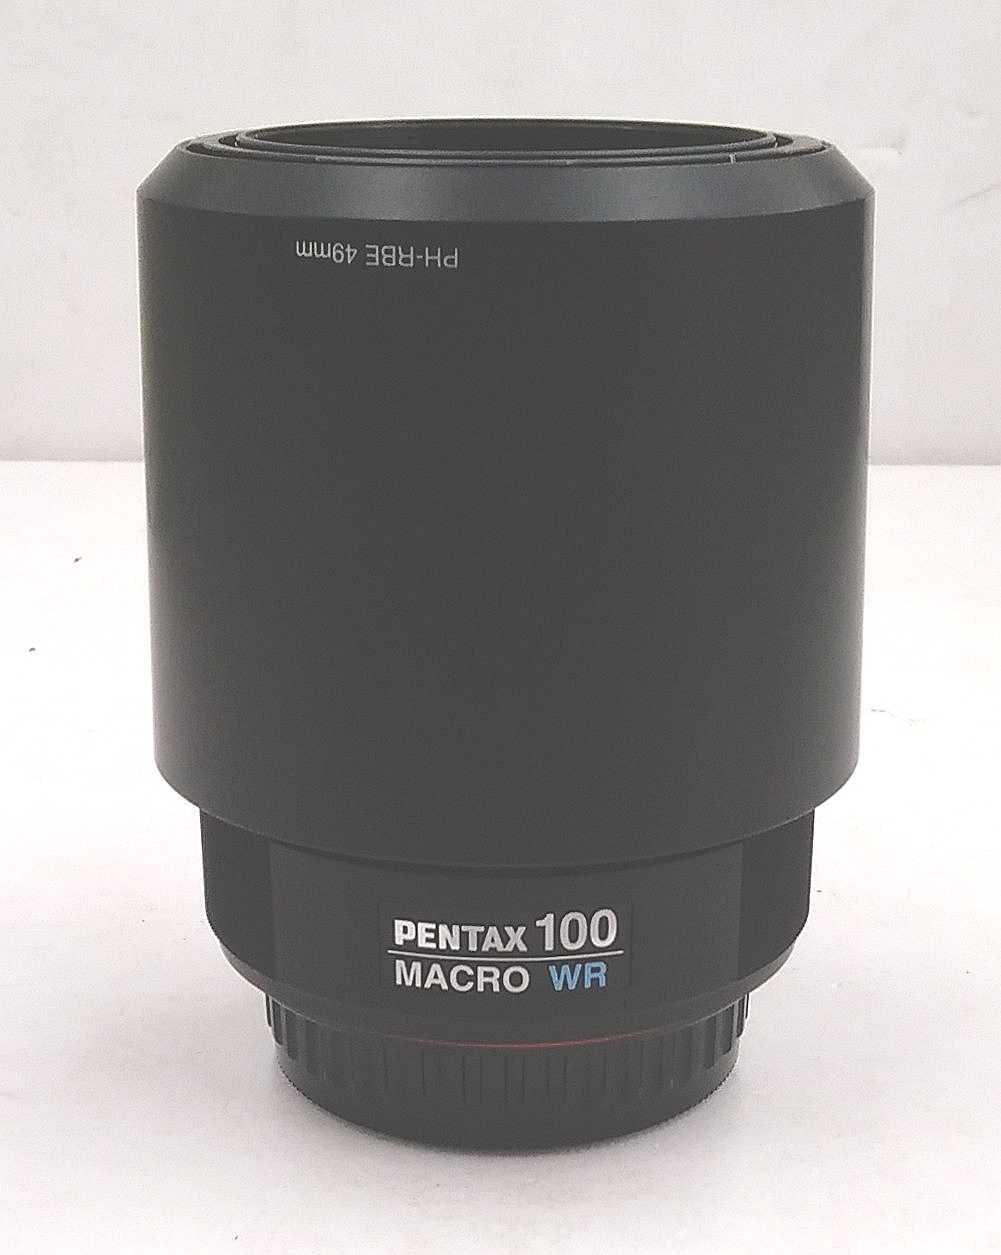 PENTAX用標準・中望遠単焦点レンズ PENTAX